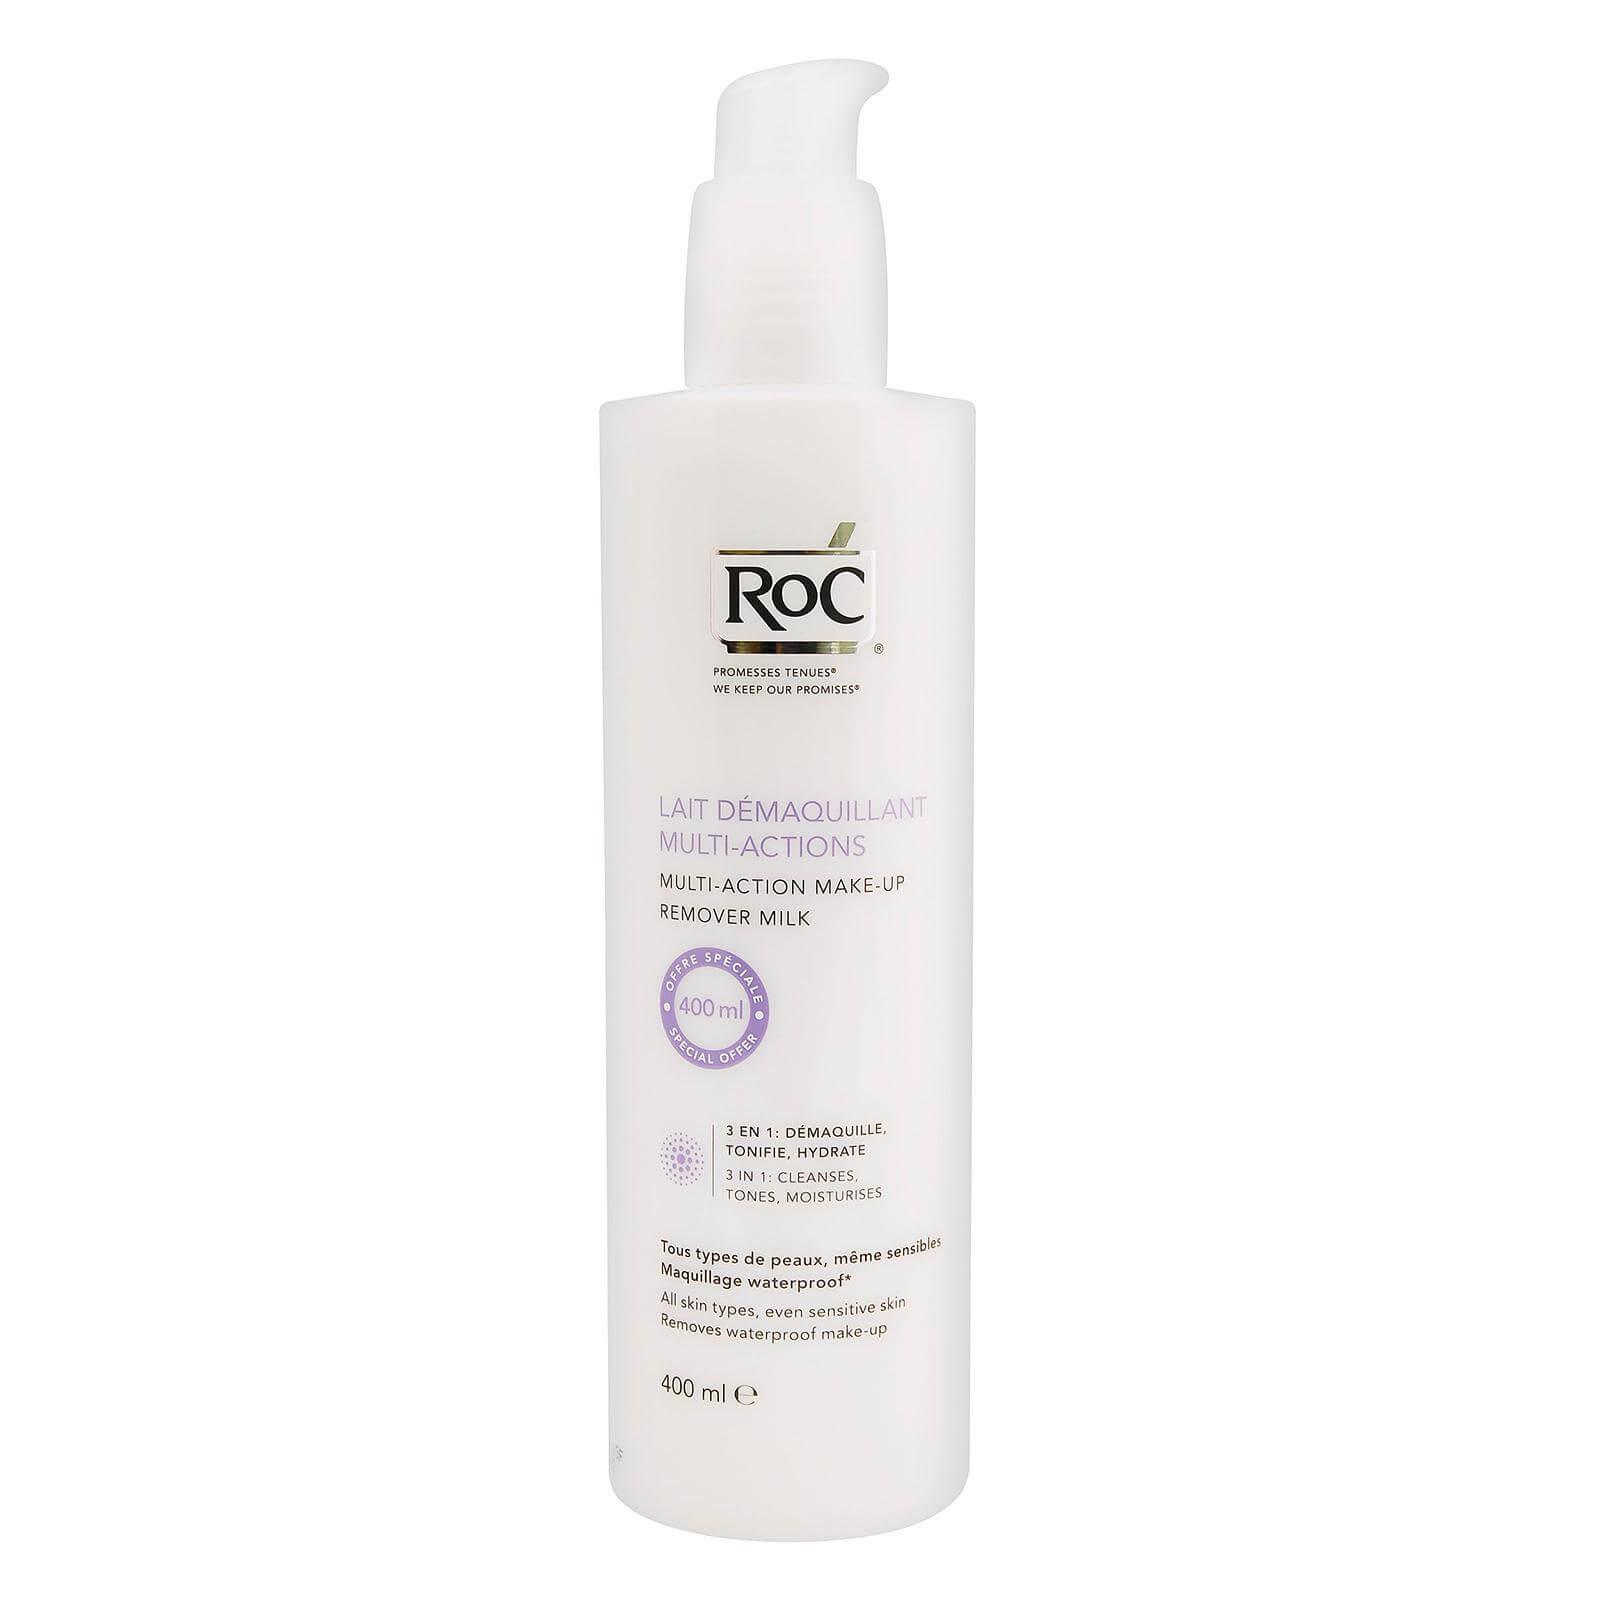 Roc Lait Demaquillant Multi-Actions 3 in 1 Λεπτόρρευστο Γαλάκτωμα Καθαρισμού-Ντεμακιγιάζ 3 σε 1 400ml Promo -20%